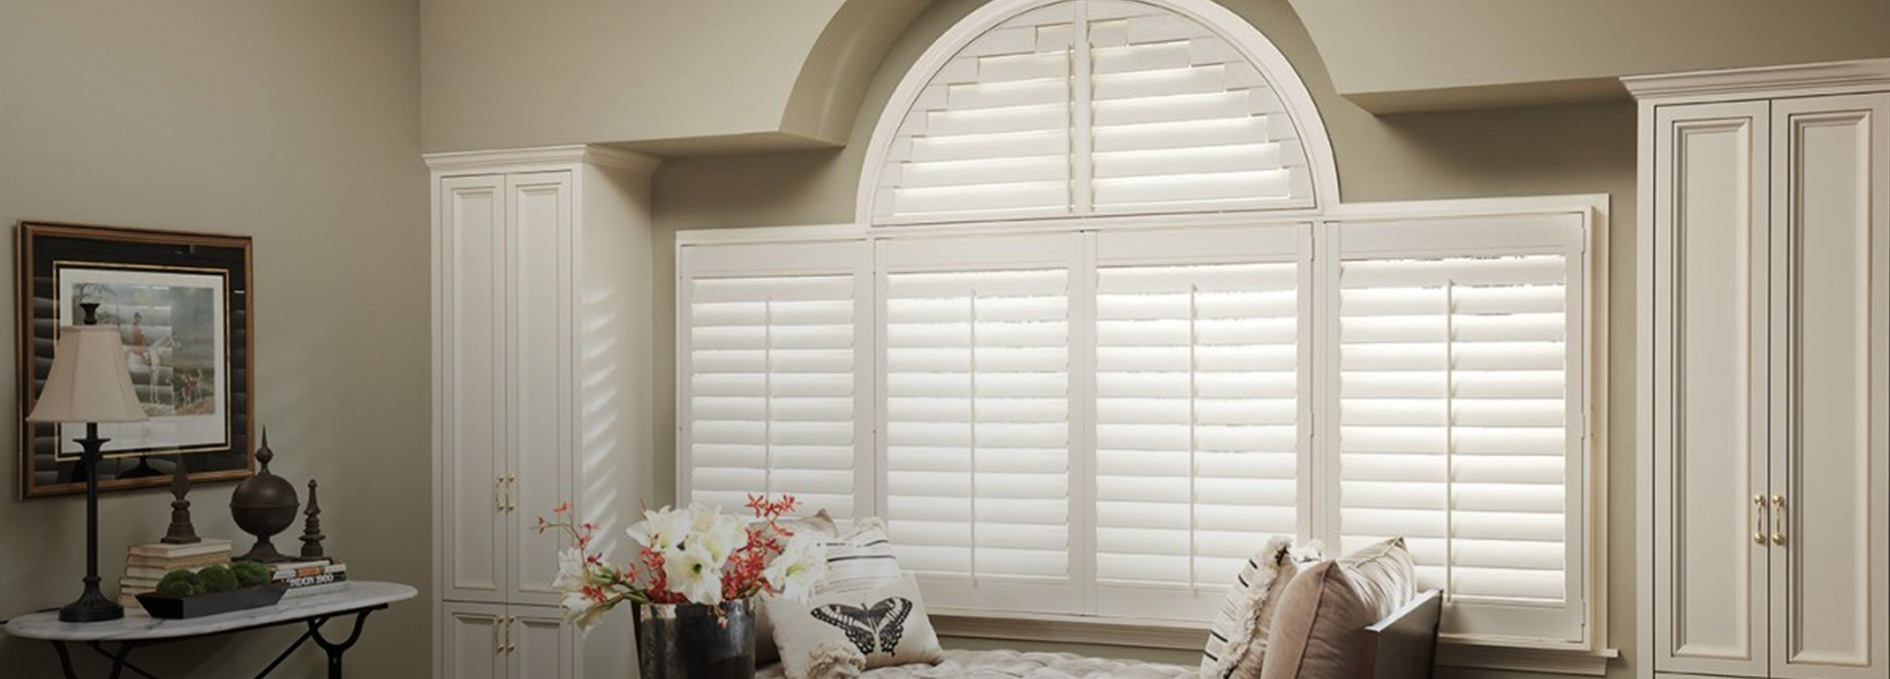 alta shades savannah blinds shutters suncatcher statesboro wood window faux fauxwood ga